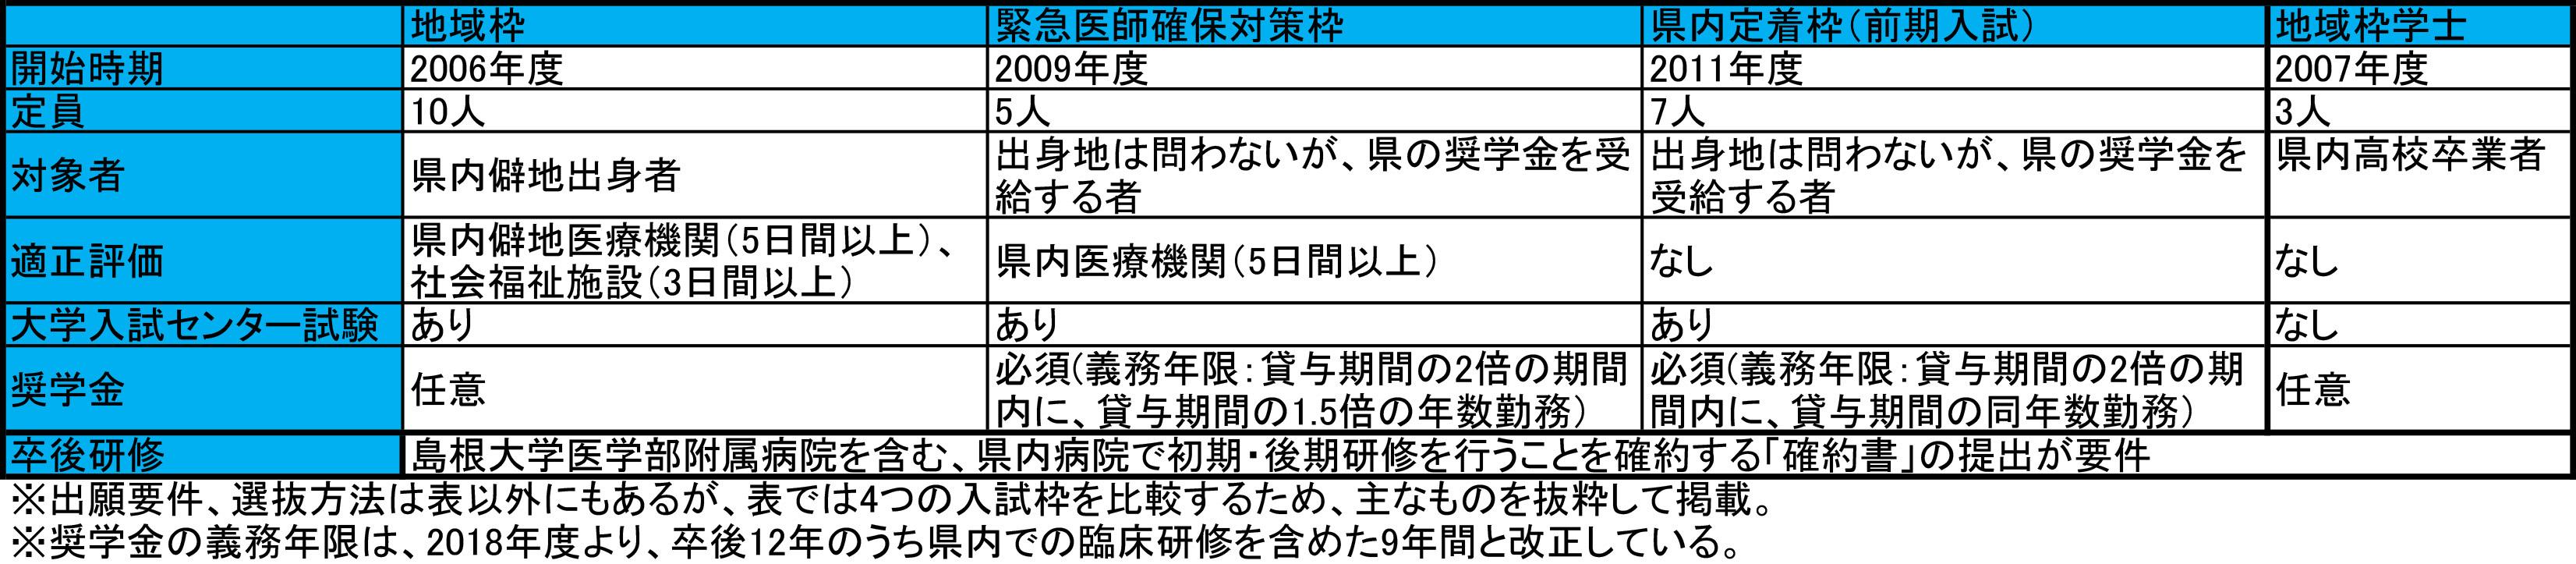 180711yhP8.jpg